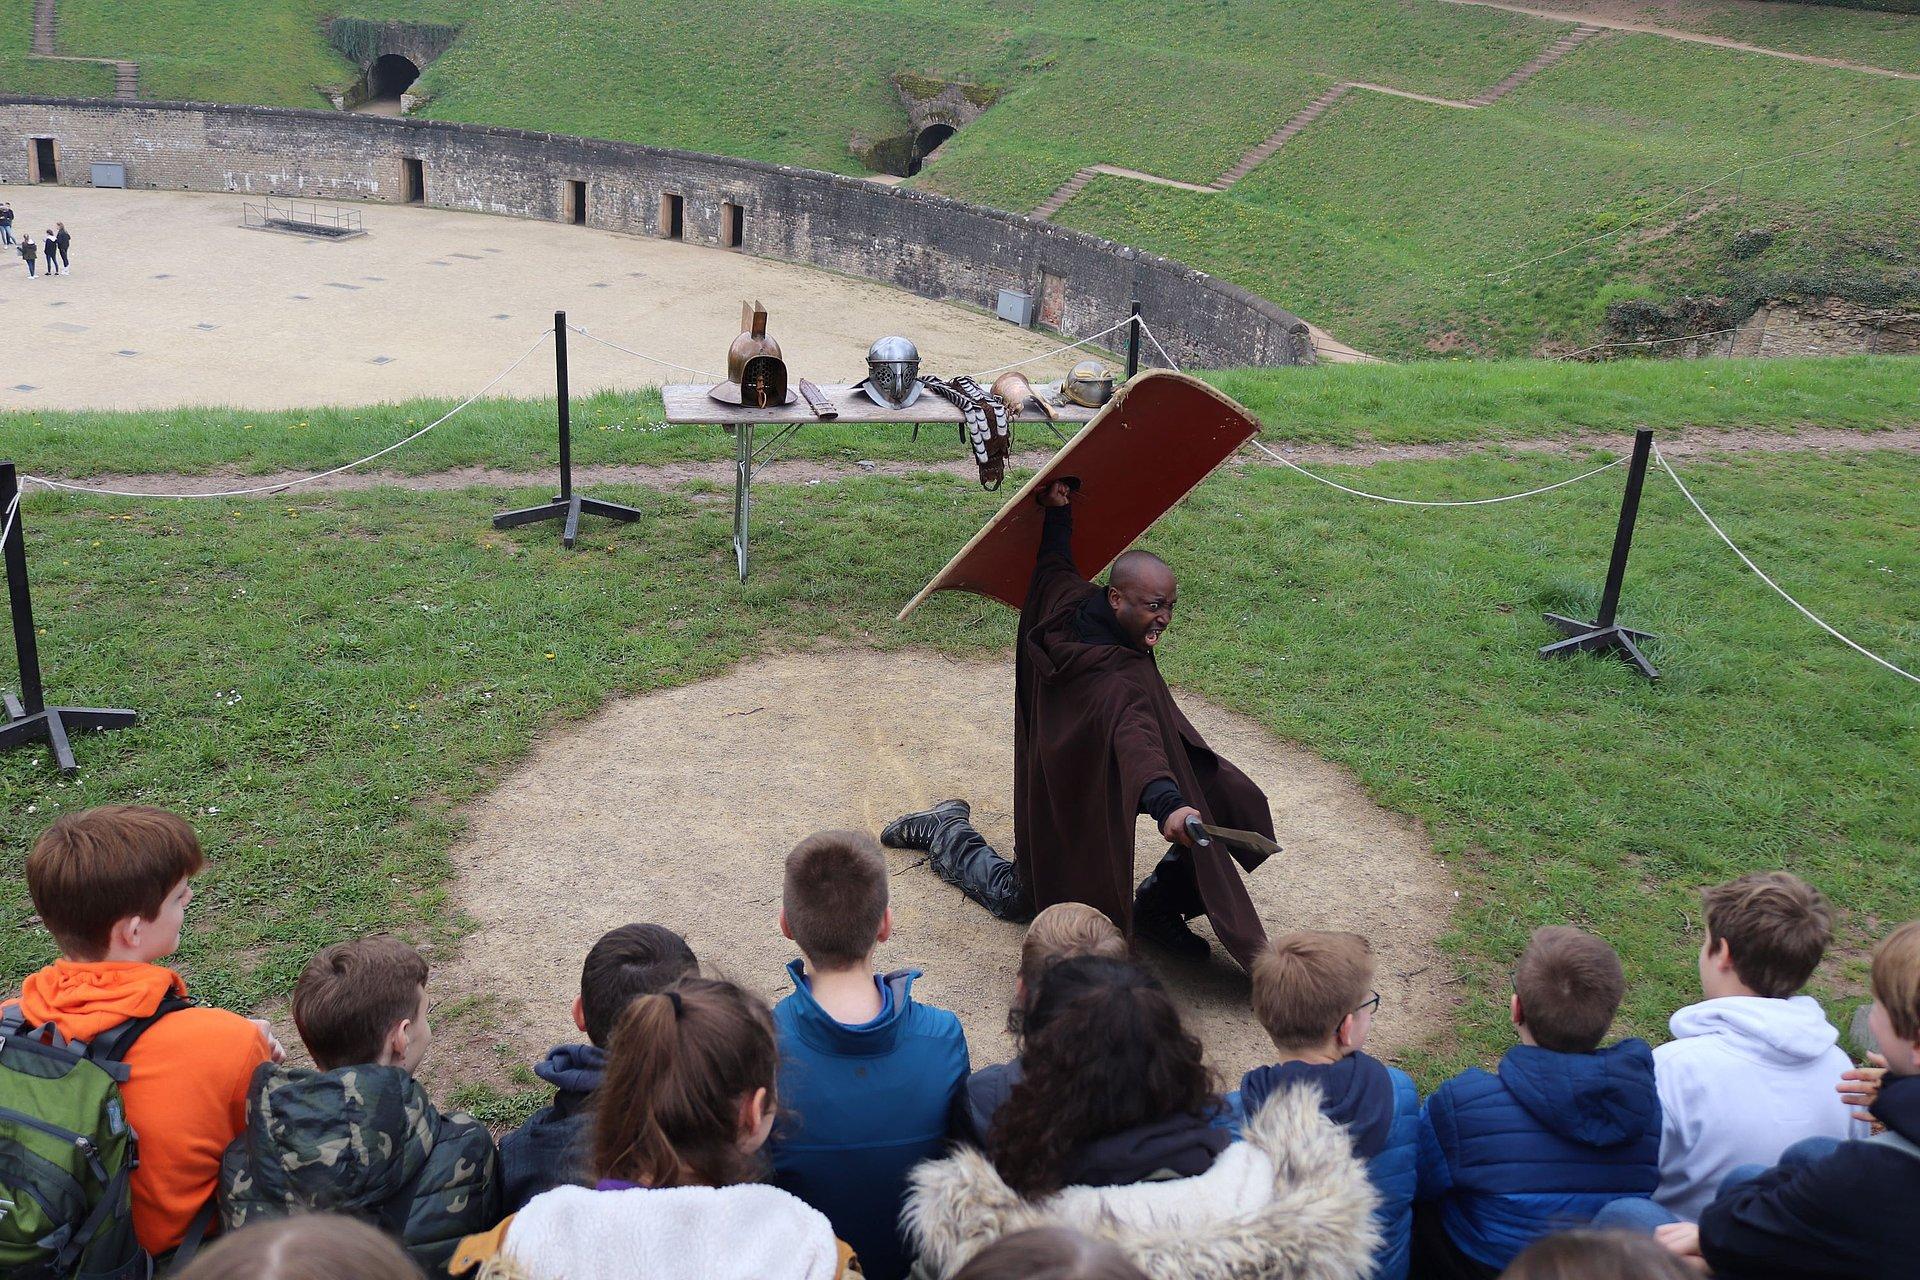 Gladiatorenworkshop in Trier, Mosel